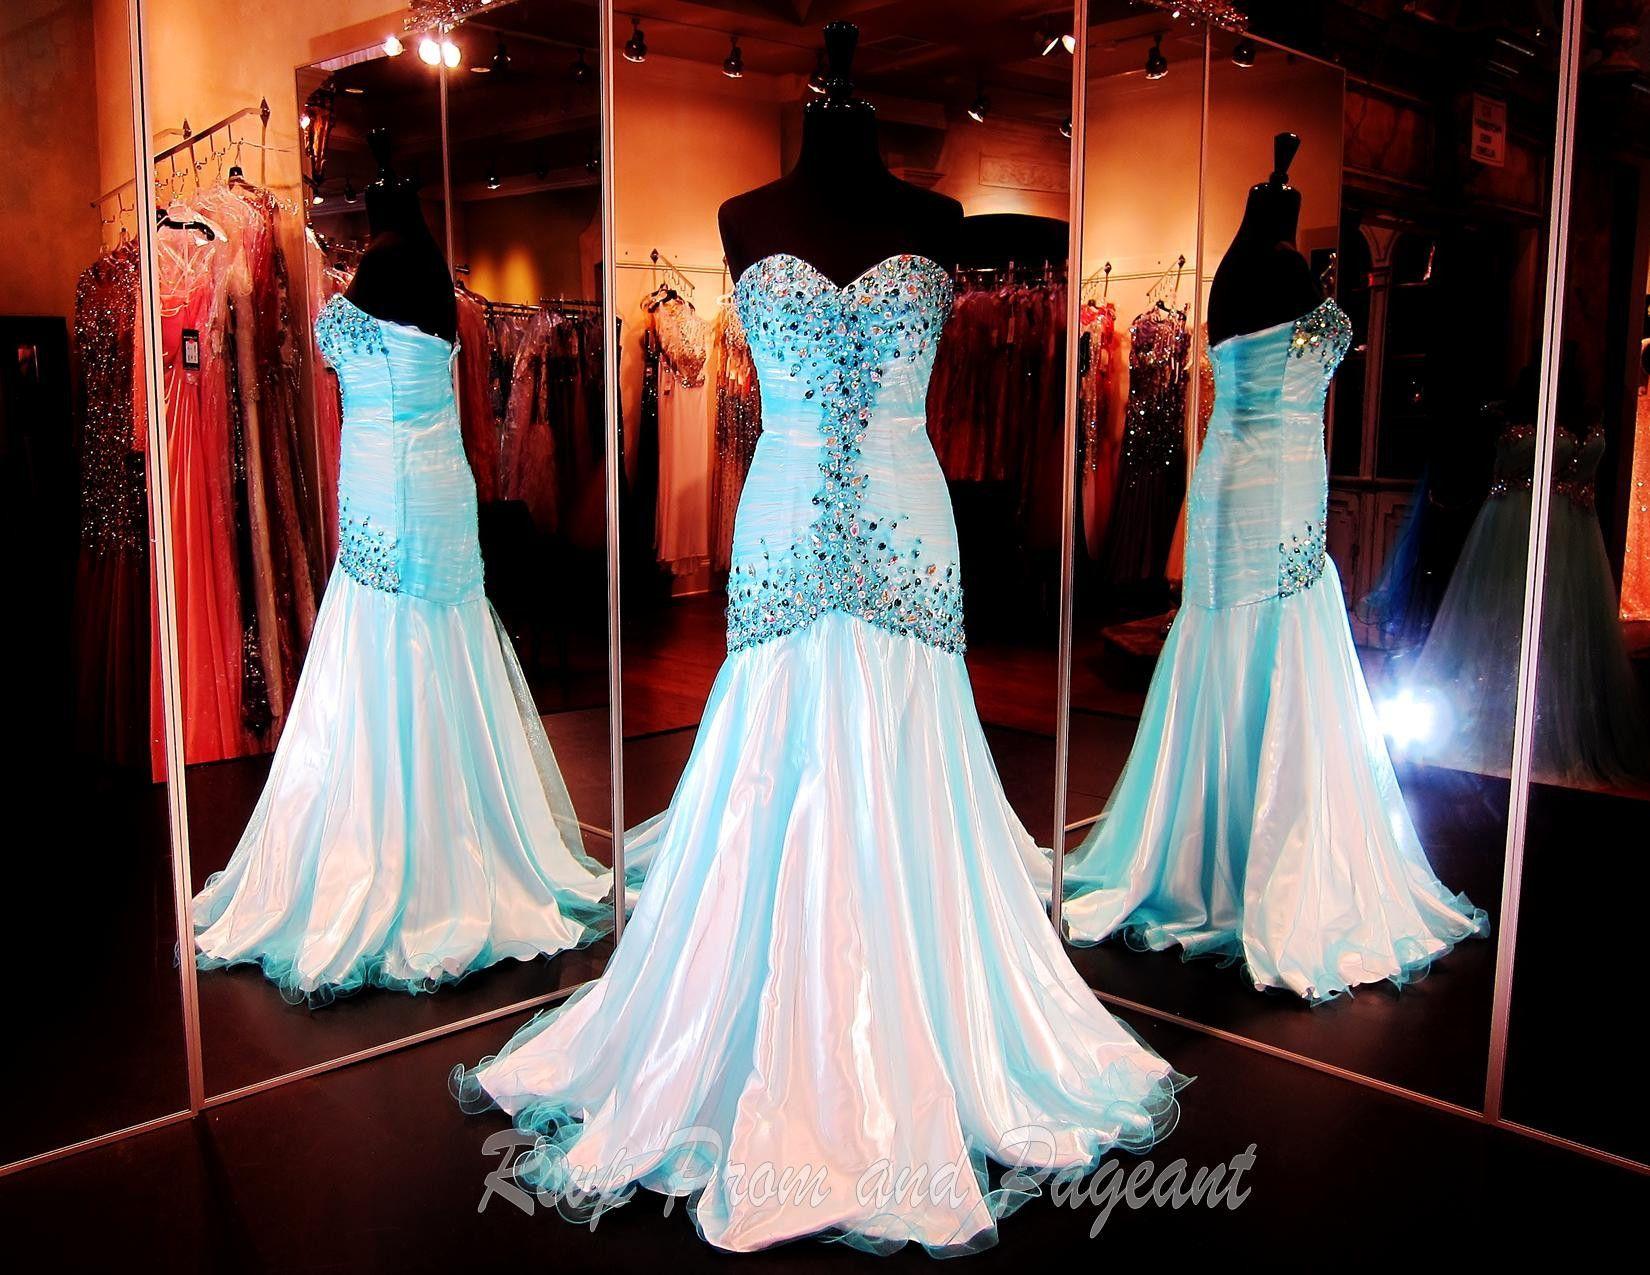 100nc010430325 Aqua Prom Store Atlanta Prom Store Lawrenceville Ga Prom Dresses Atlanta Prom Dresses Lawr Prom Dresses Atlanta Dresses Pageant Dresses